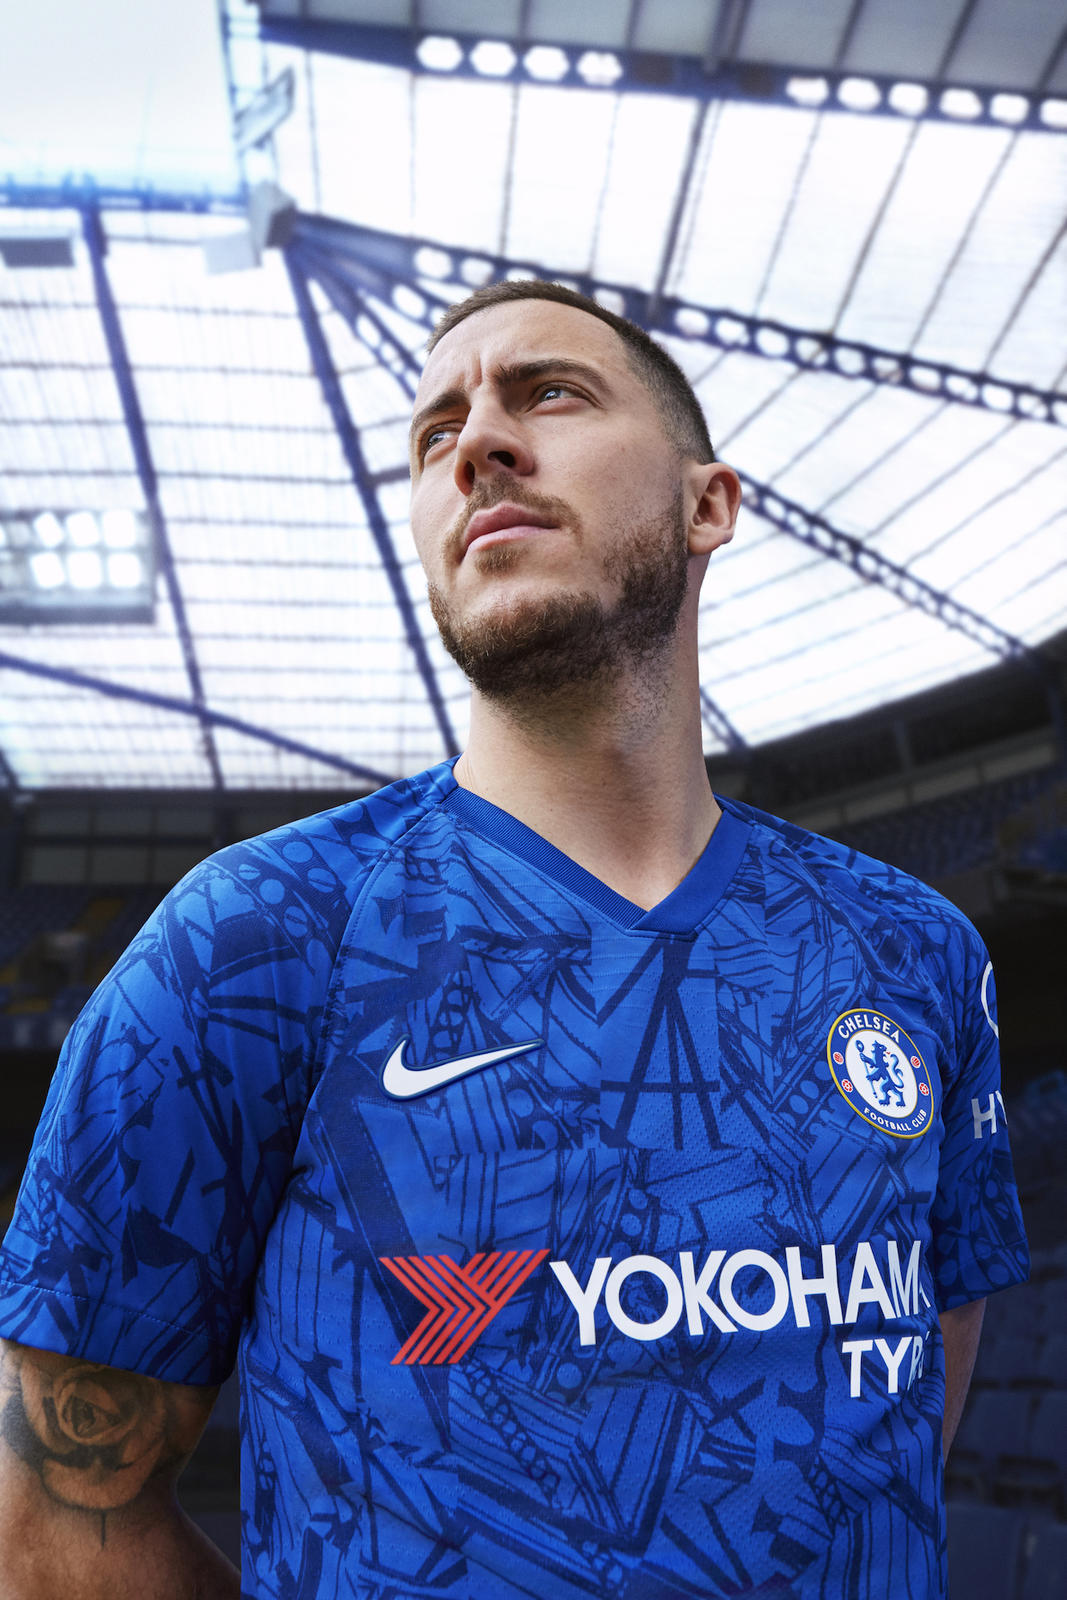 Nike_ChelseaFC_HomeKit_2019-20_4_native_1600.jpg